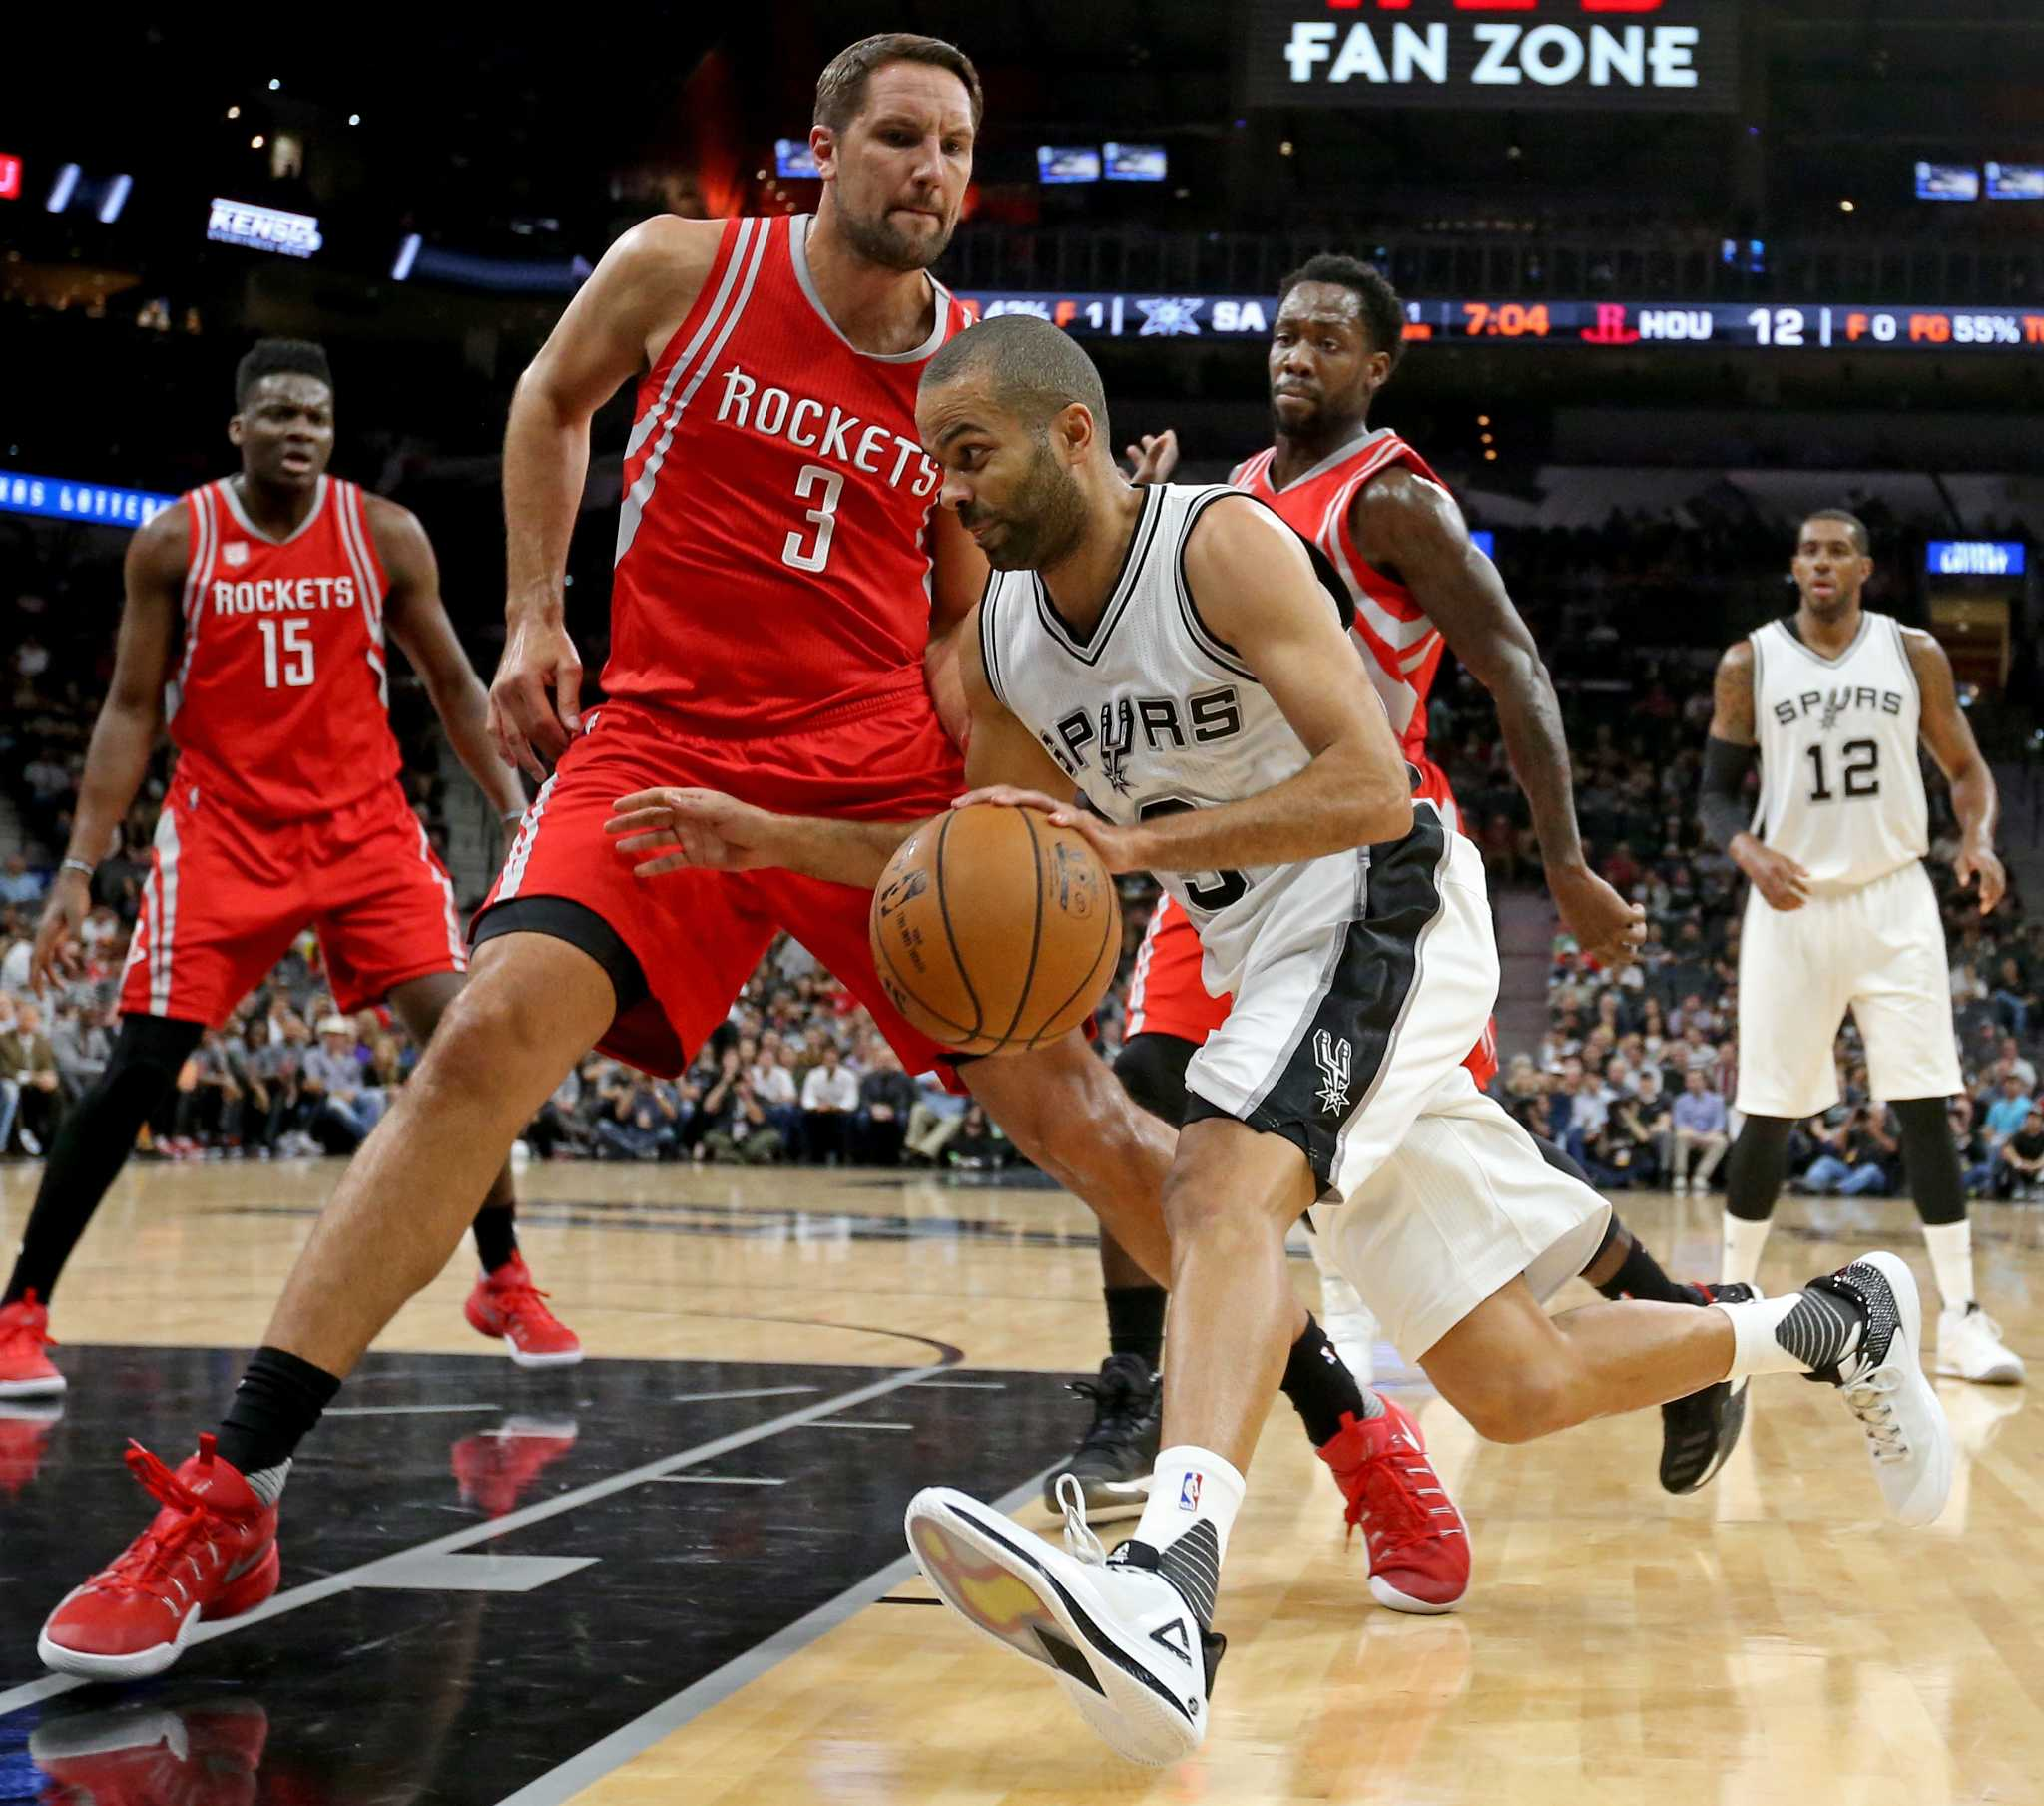 Rejuvenated Tony Parker could give Spurs boost versus Rockets